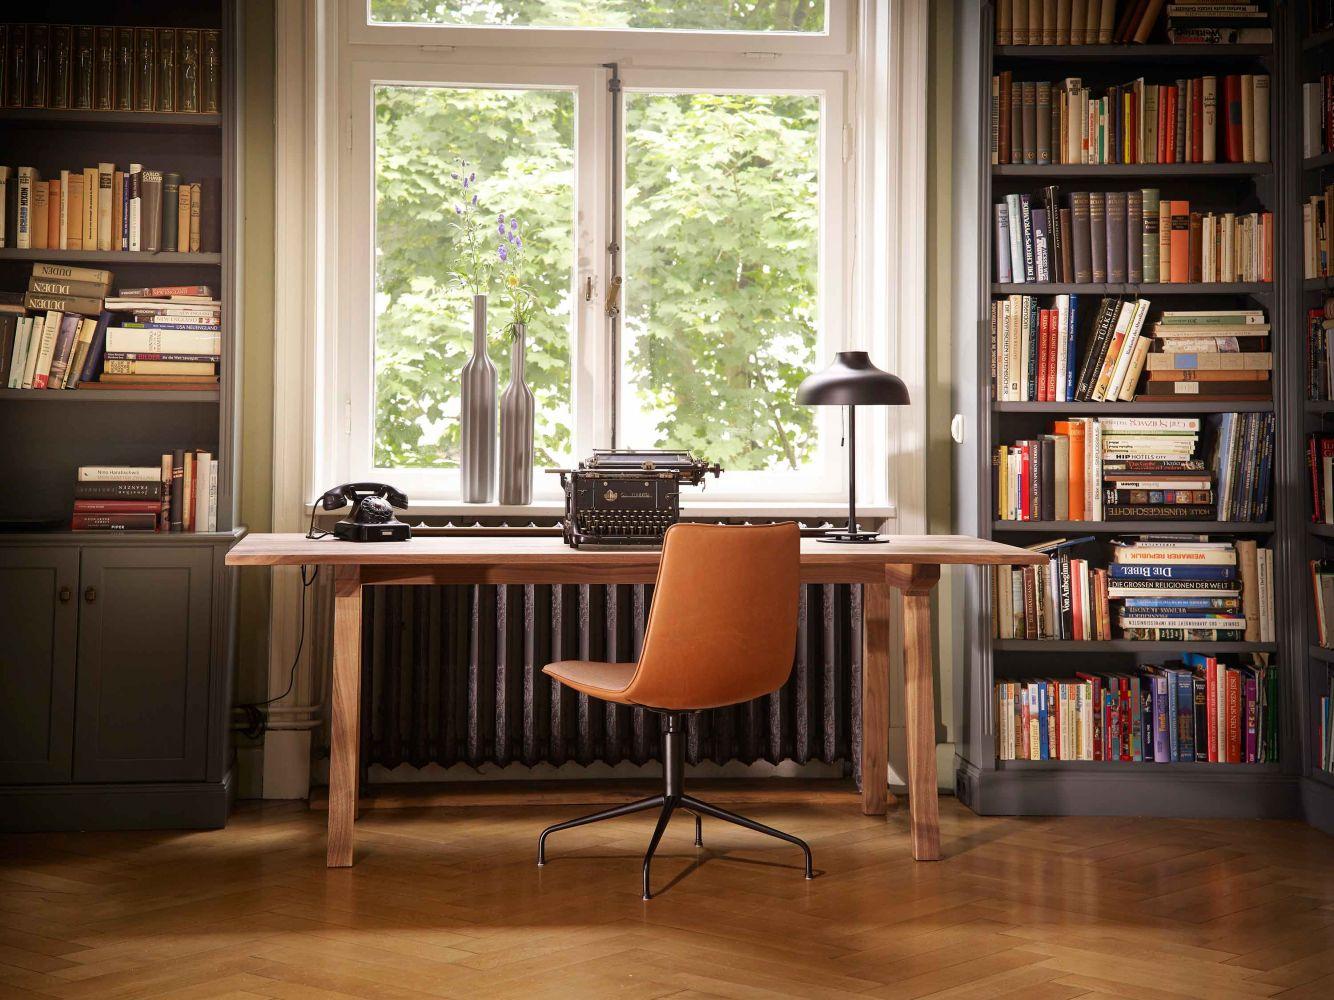 Freifrau Gärtner Internationale Möbel